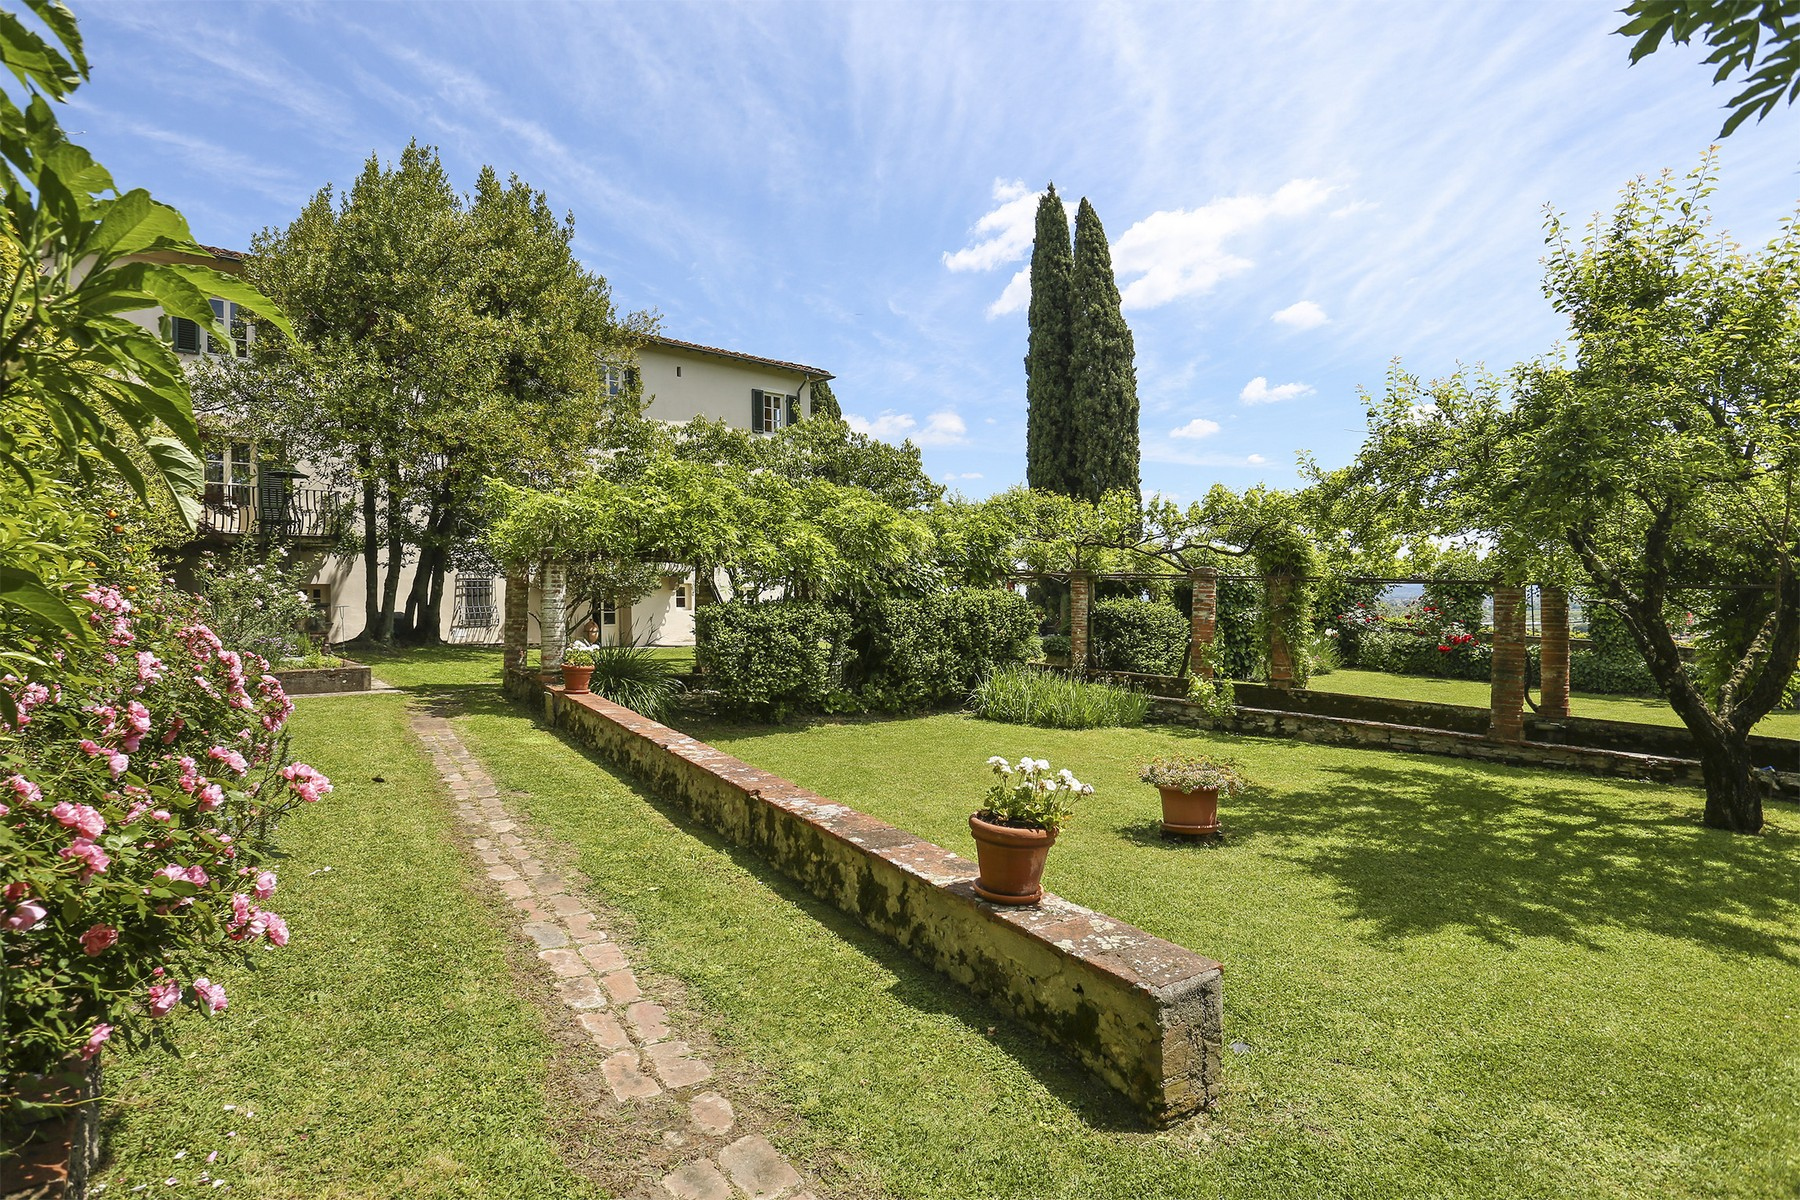 Villa in Vendita a Lucca: 5 locali, 735 mq - Foto 29